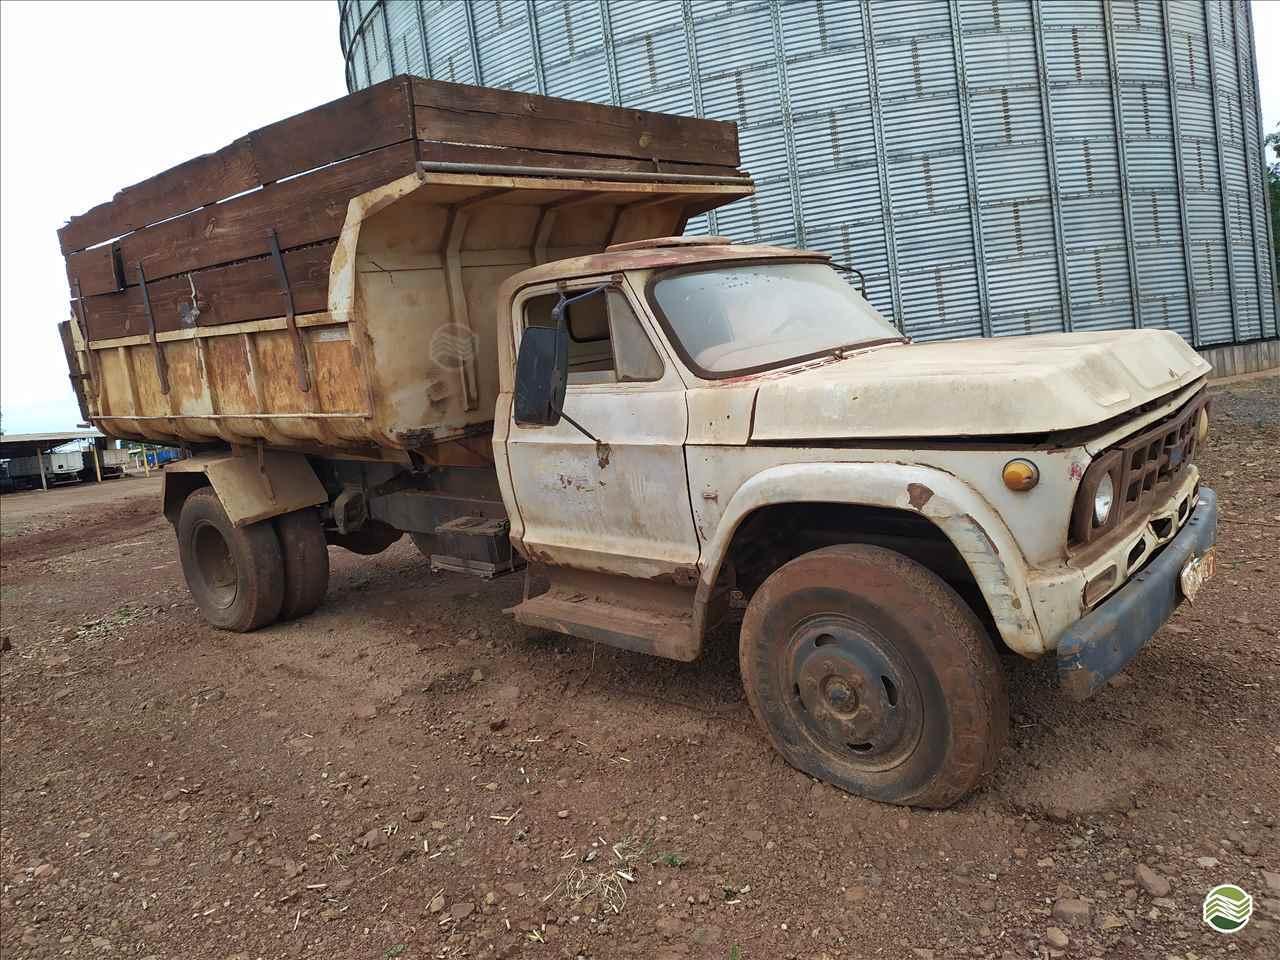 GM D60 00000000km 1981/1981 Aquy Tratores